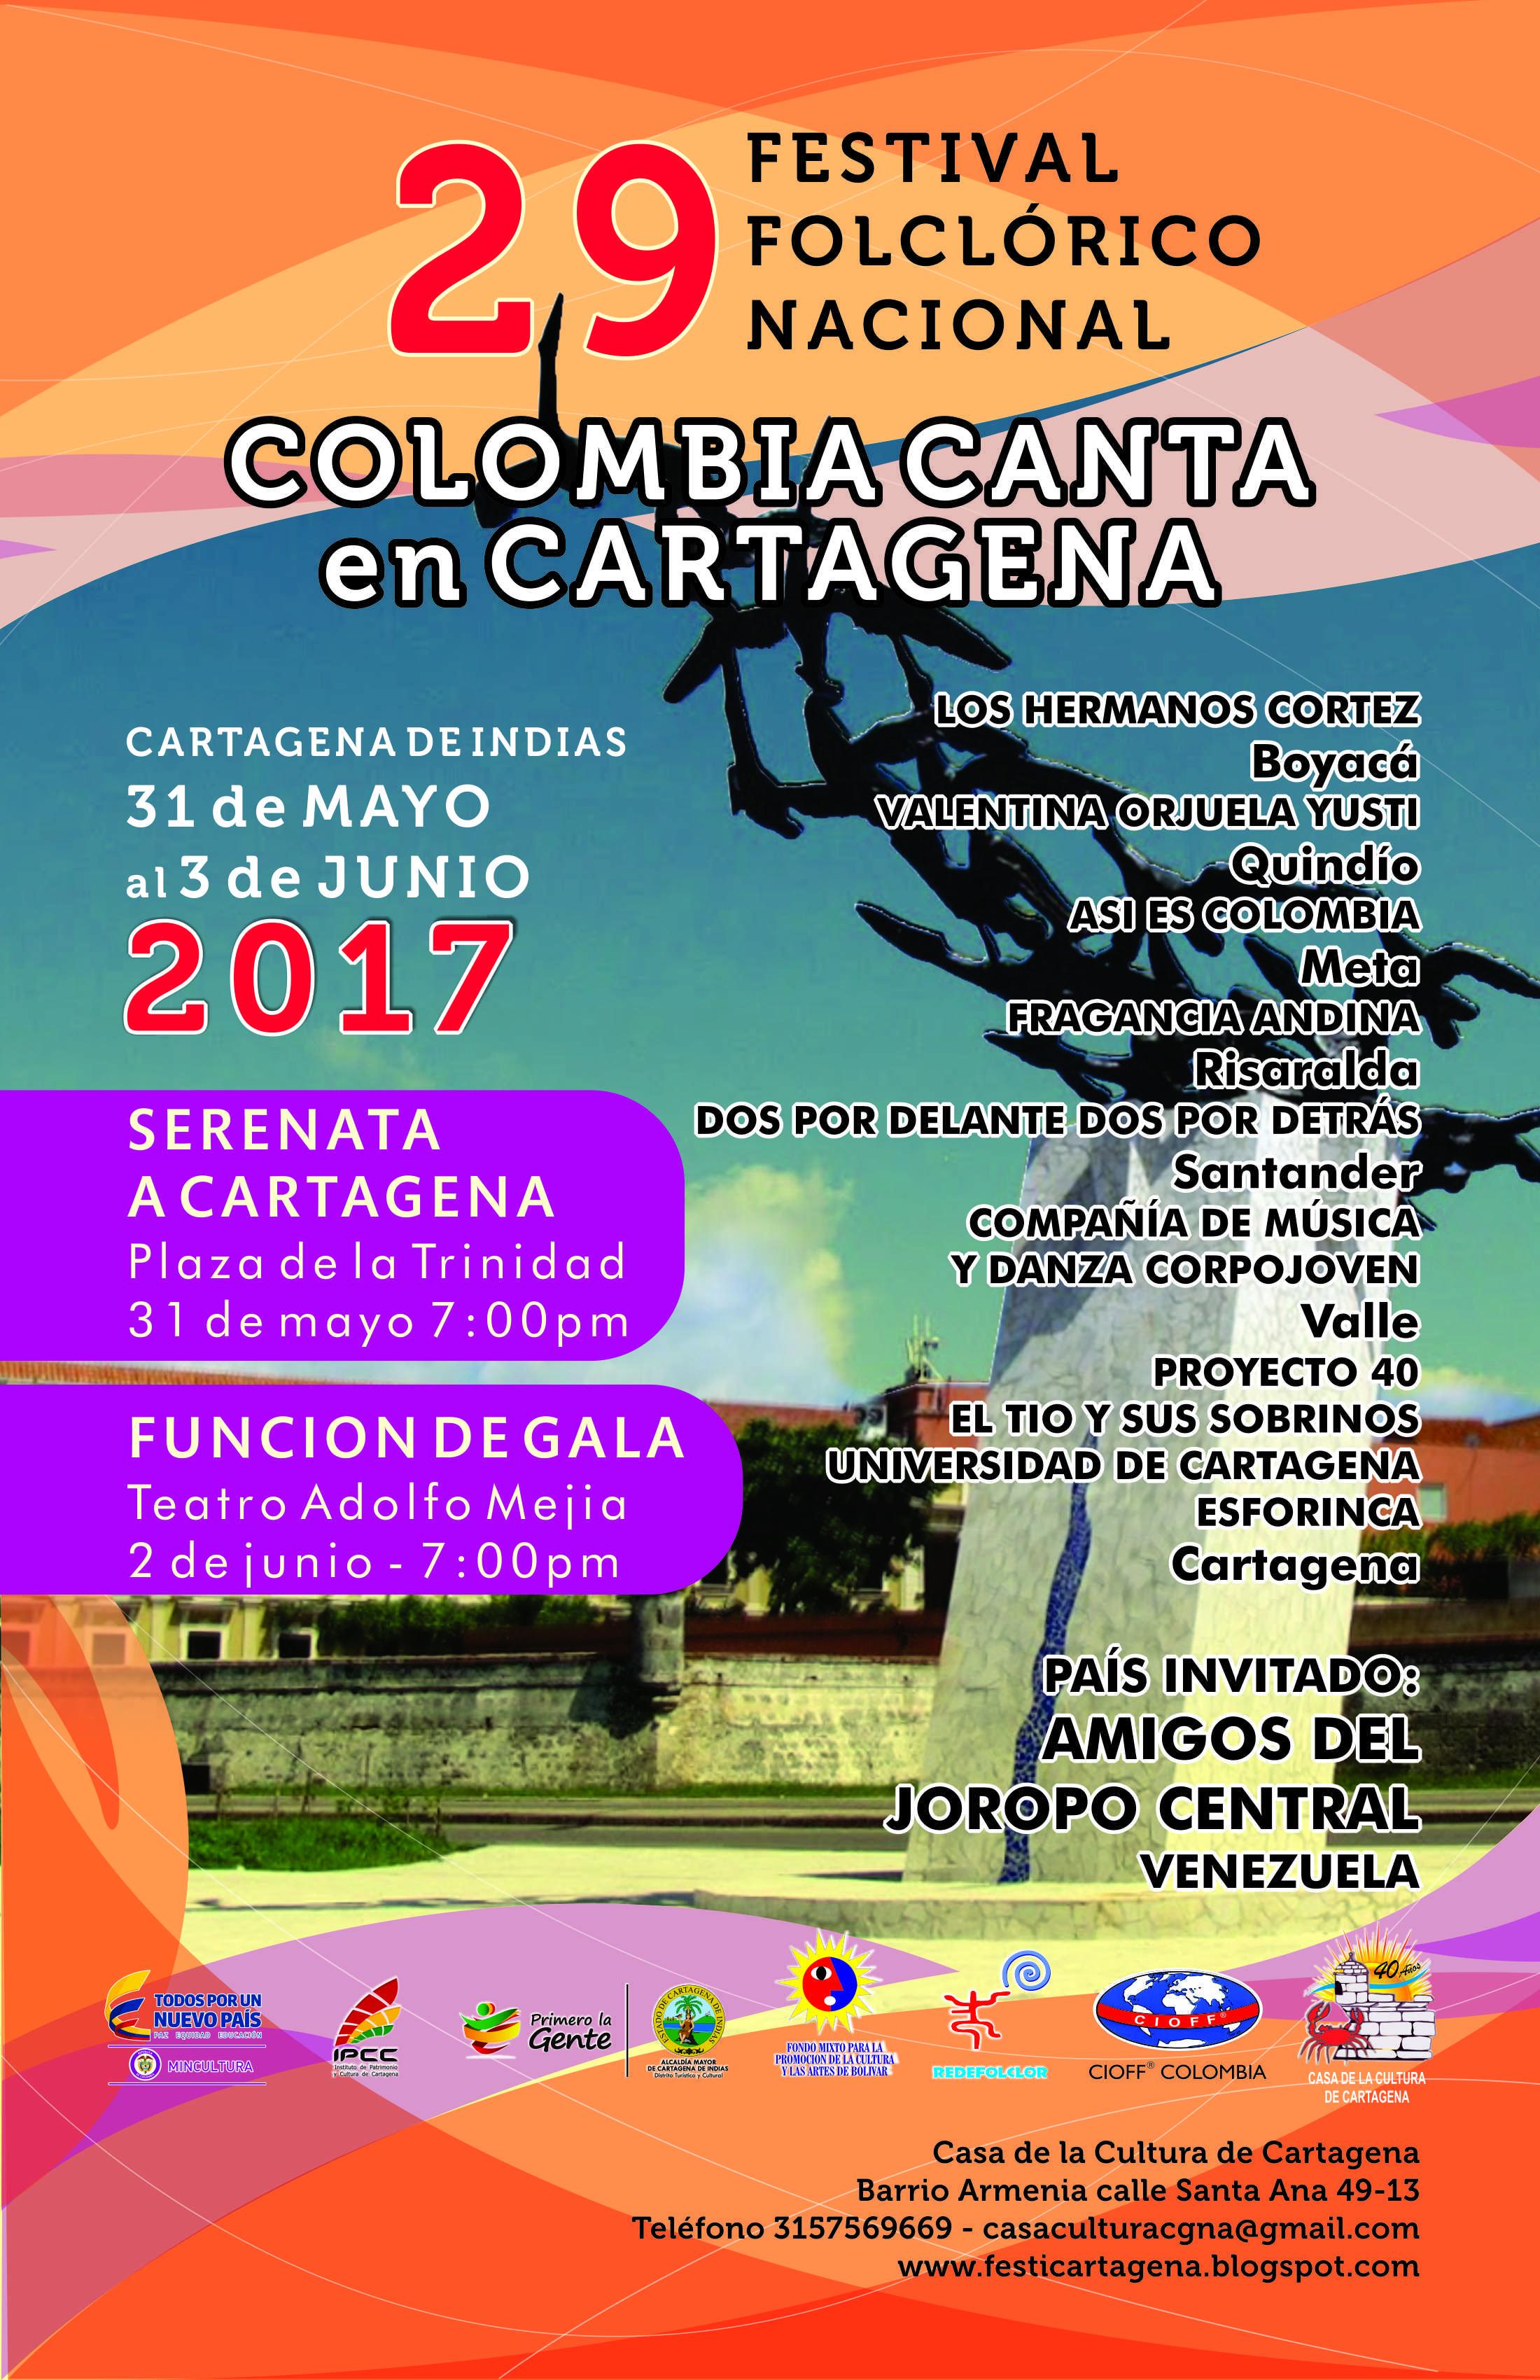 29 FESTIVAL FOLCLÓRICO NACIONAL «COLOMBIA CANTA EN CARTAGENA - Afiche-colombia-canta-en-cartagena